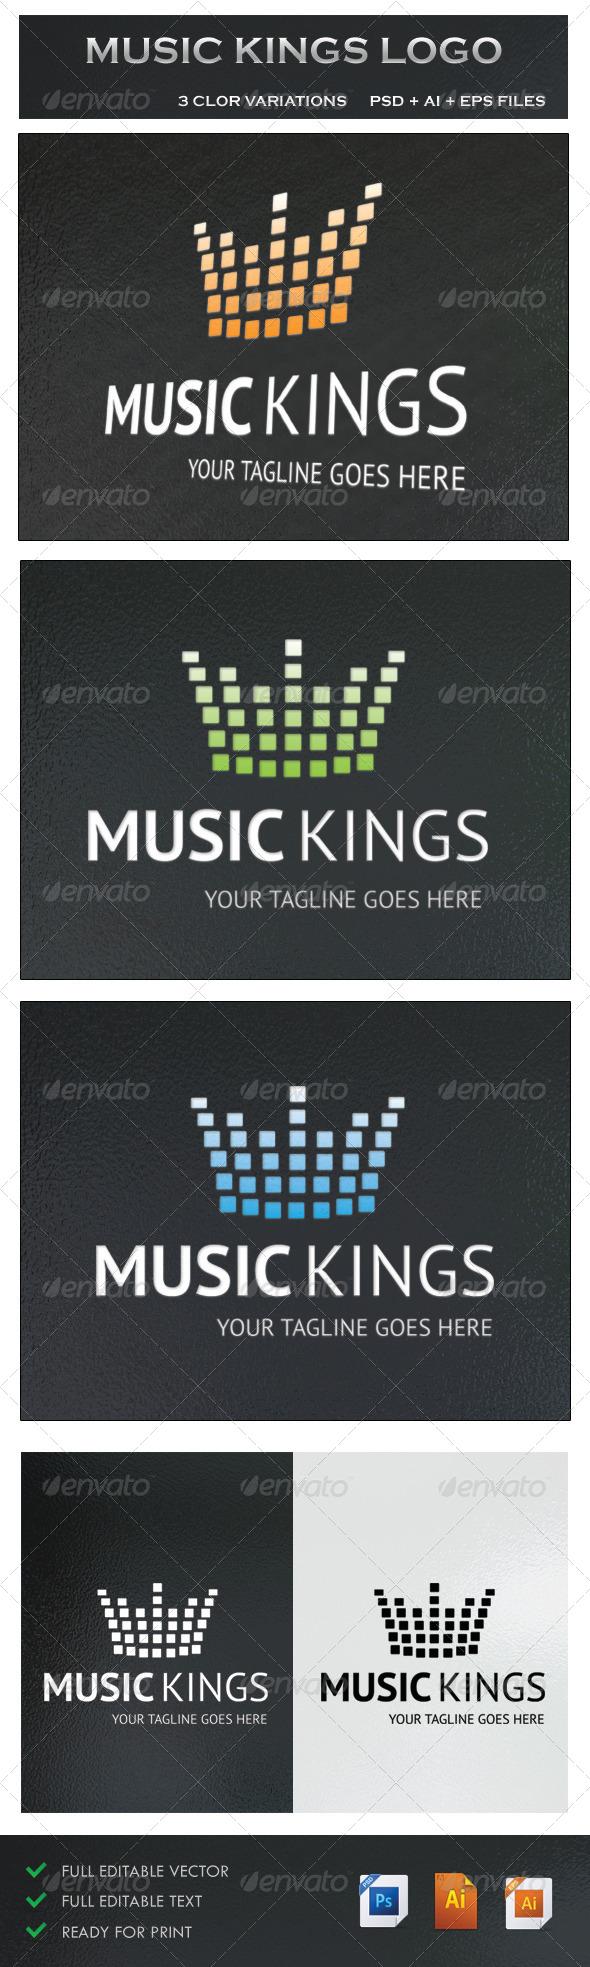 GraphicRiver Music Kings Logo 5242731